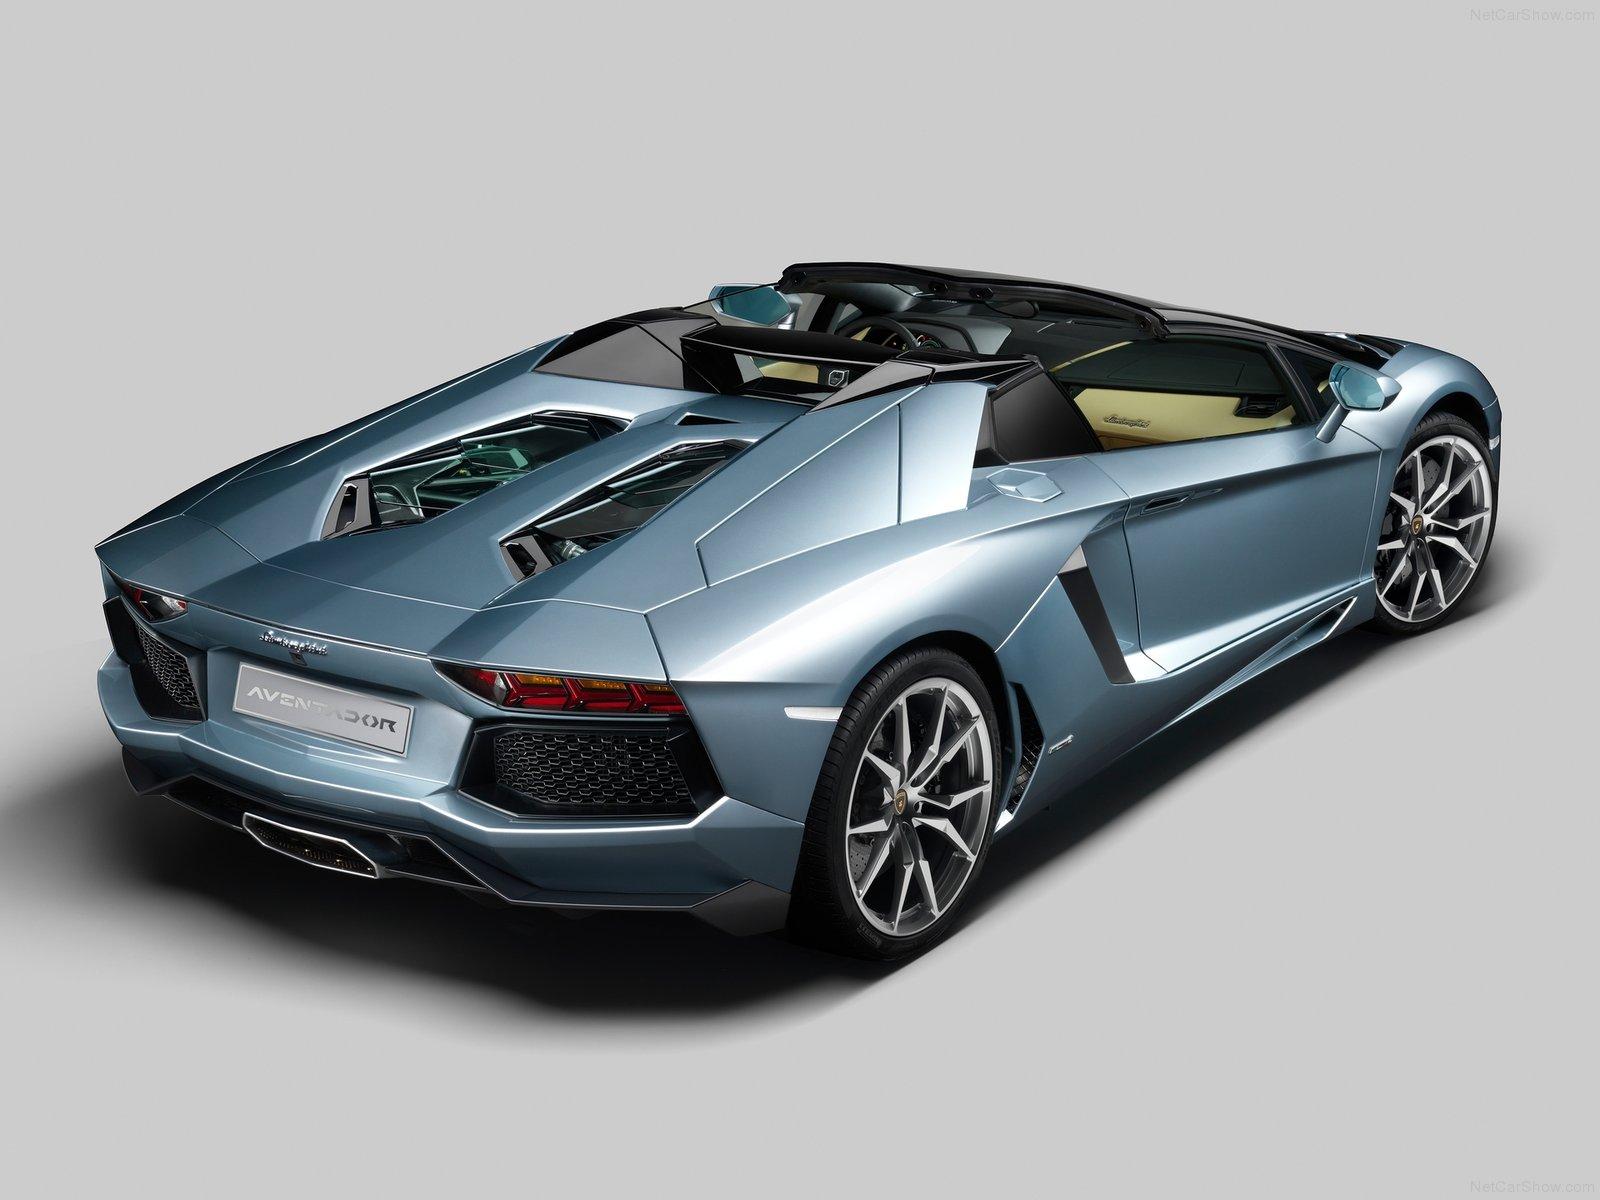 http://2.bp.blogspot.com/-Cc5pIEVe7JE/ULnYkg5MfDI/AAAAAAAADZk/PfmA27as2p4/s1600/Lamborghini-Aventador_LP700-4_Roadster_2014_1600x1200_wallpaper_12.jpg